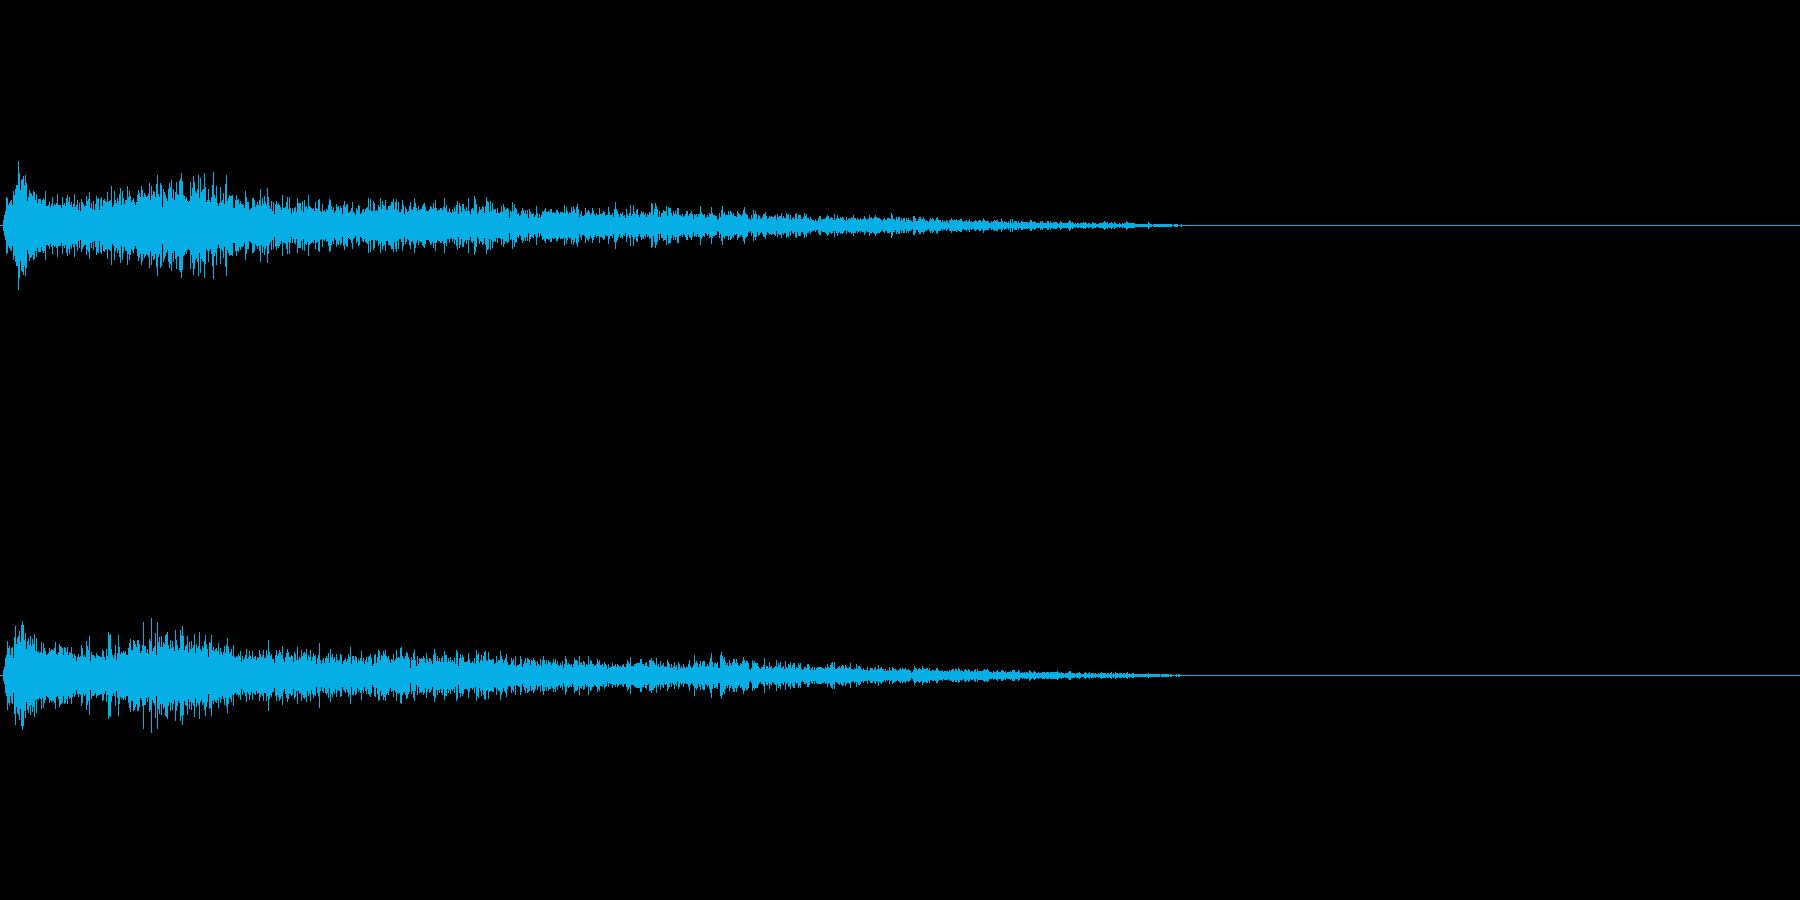 Aマイナー インパクト音 衝撃音の再生済みの波形